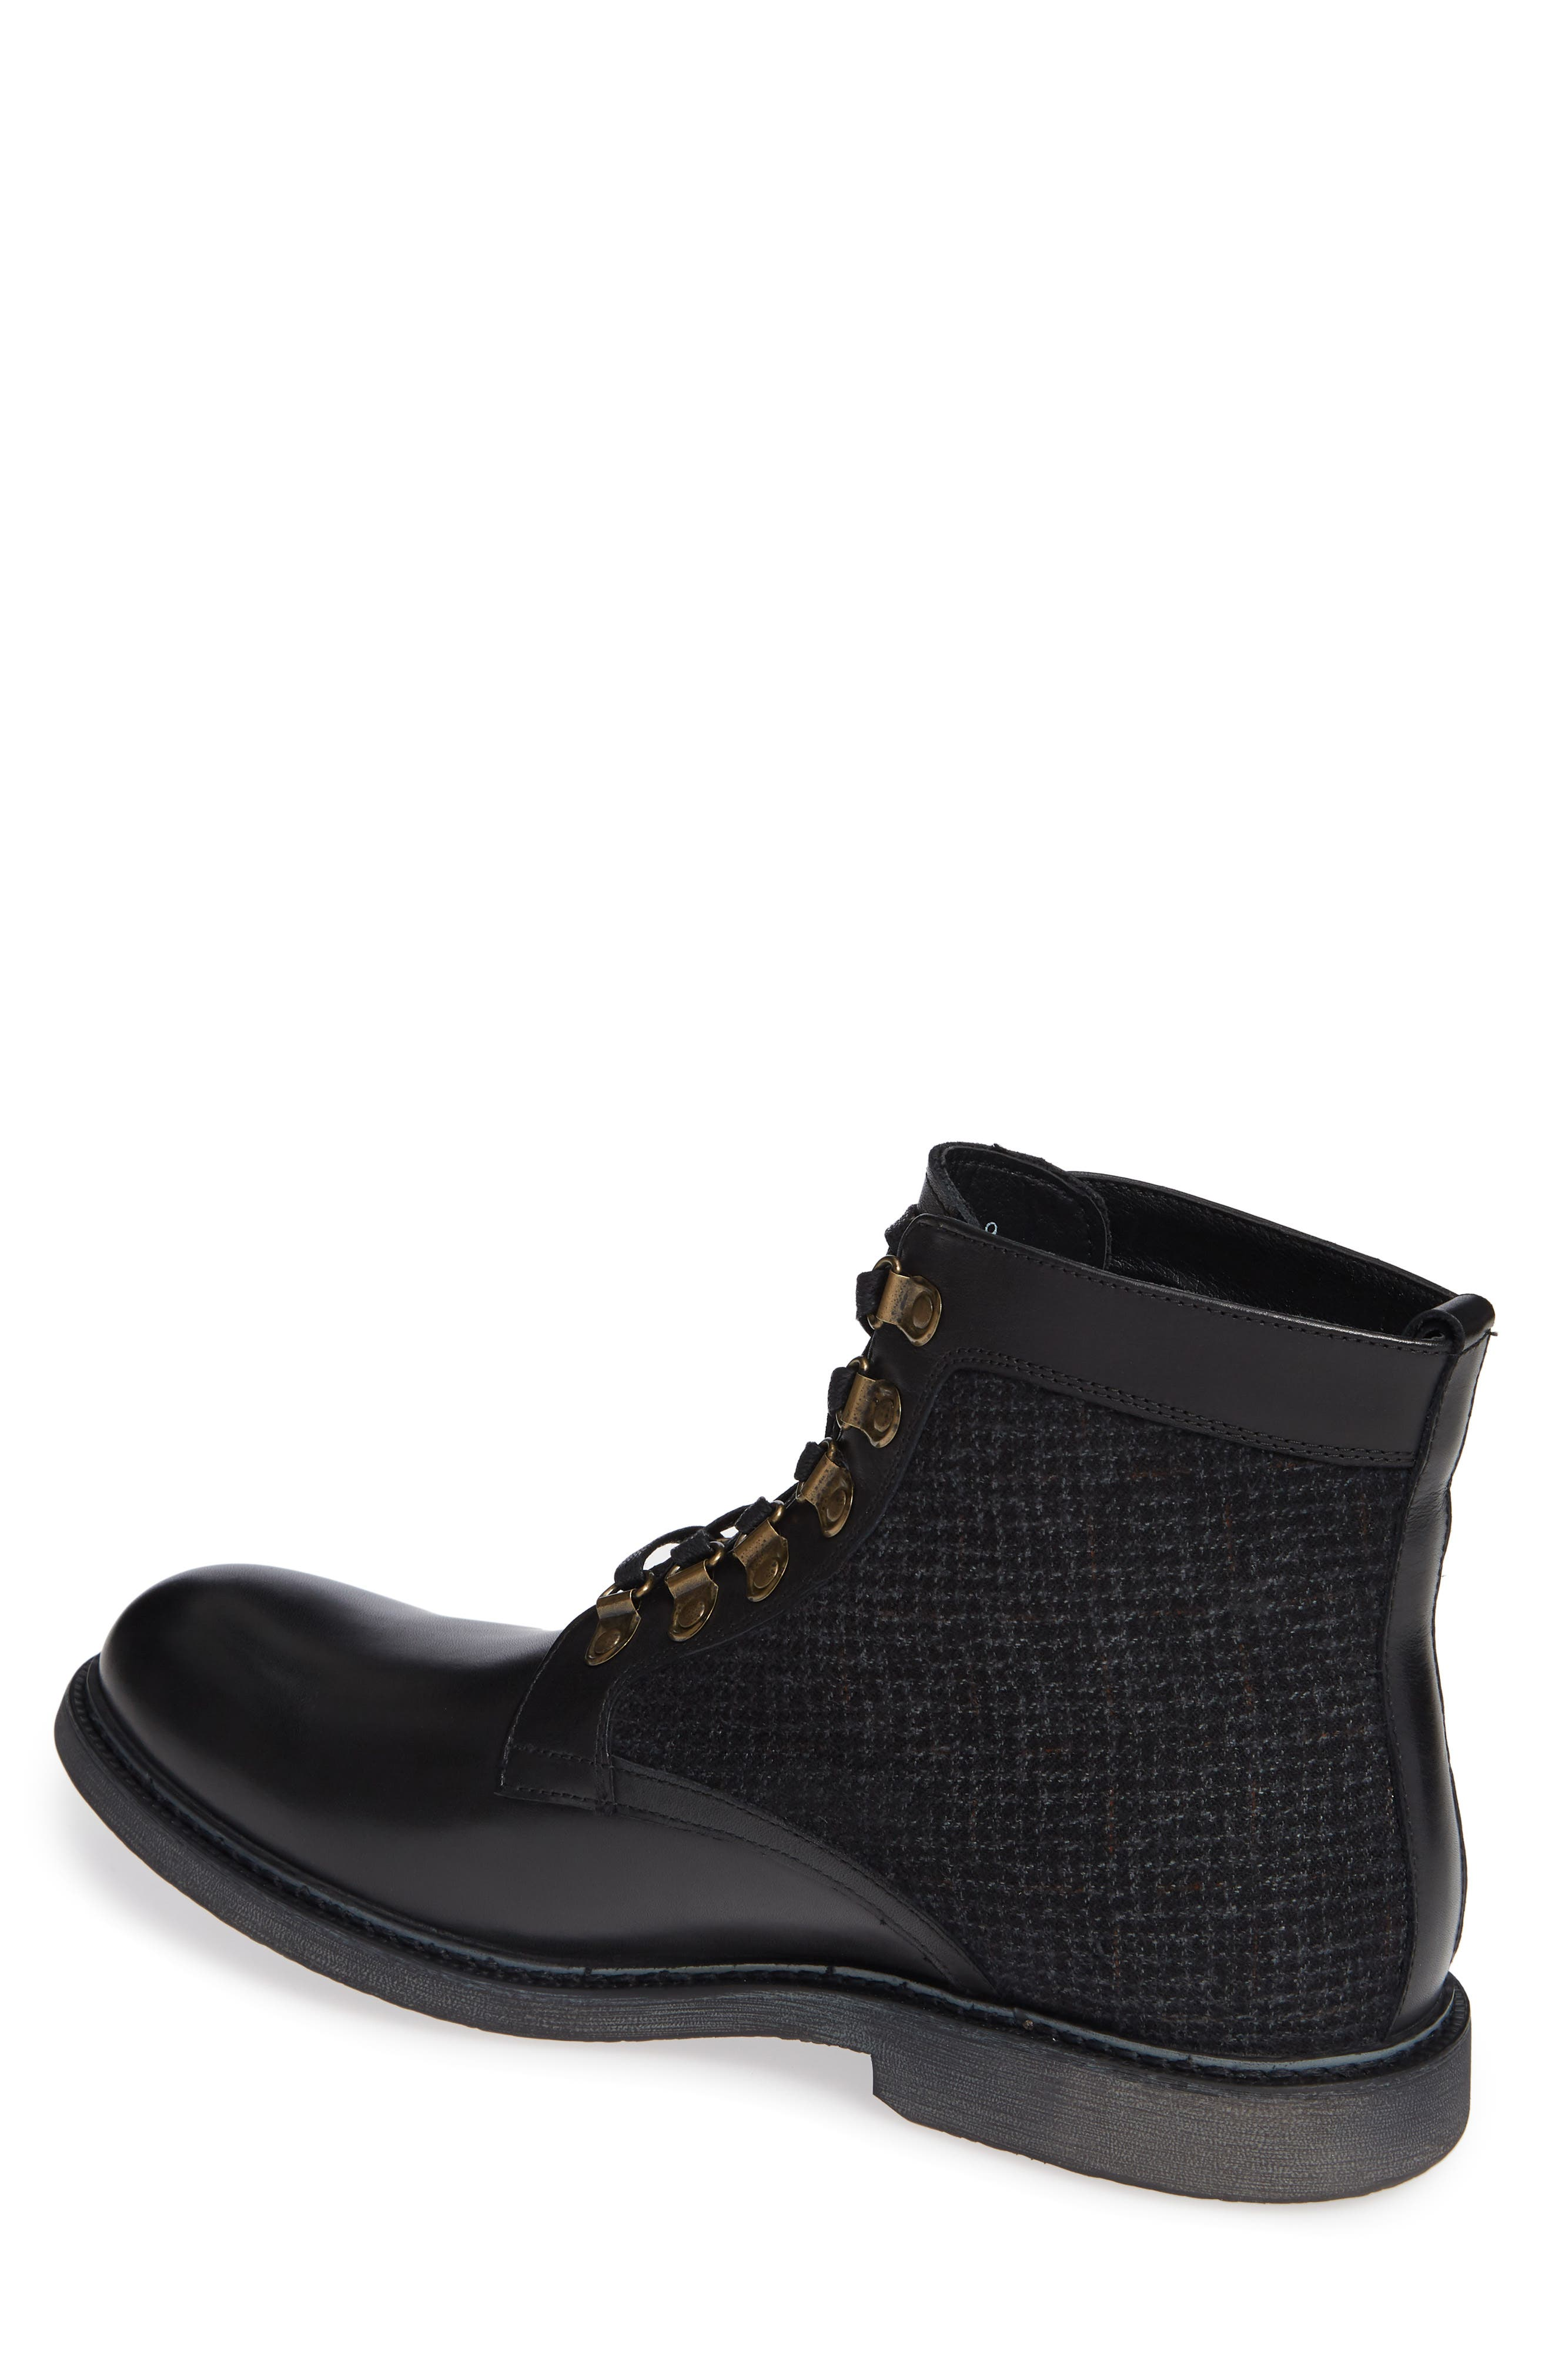 Bradford Textured Suede Boot,                             Alternate thumbnail 2, color,                             BLACK